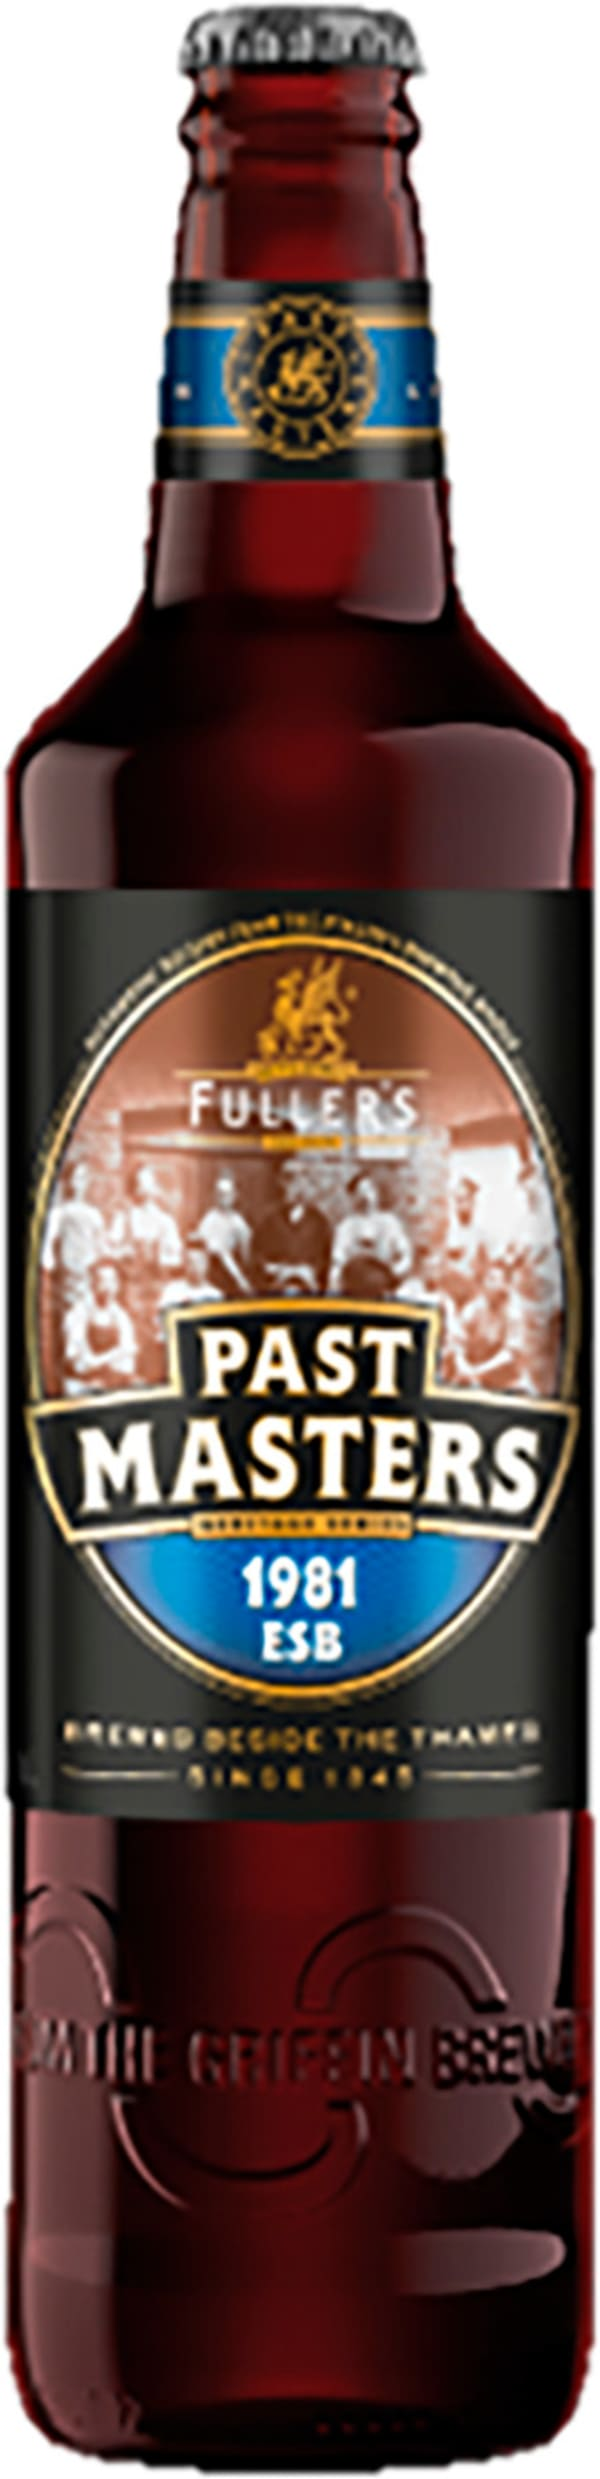 Fuller's Past Masters 1981 ESB